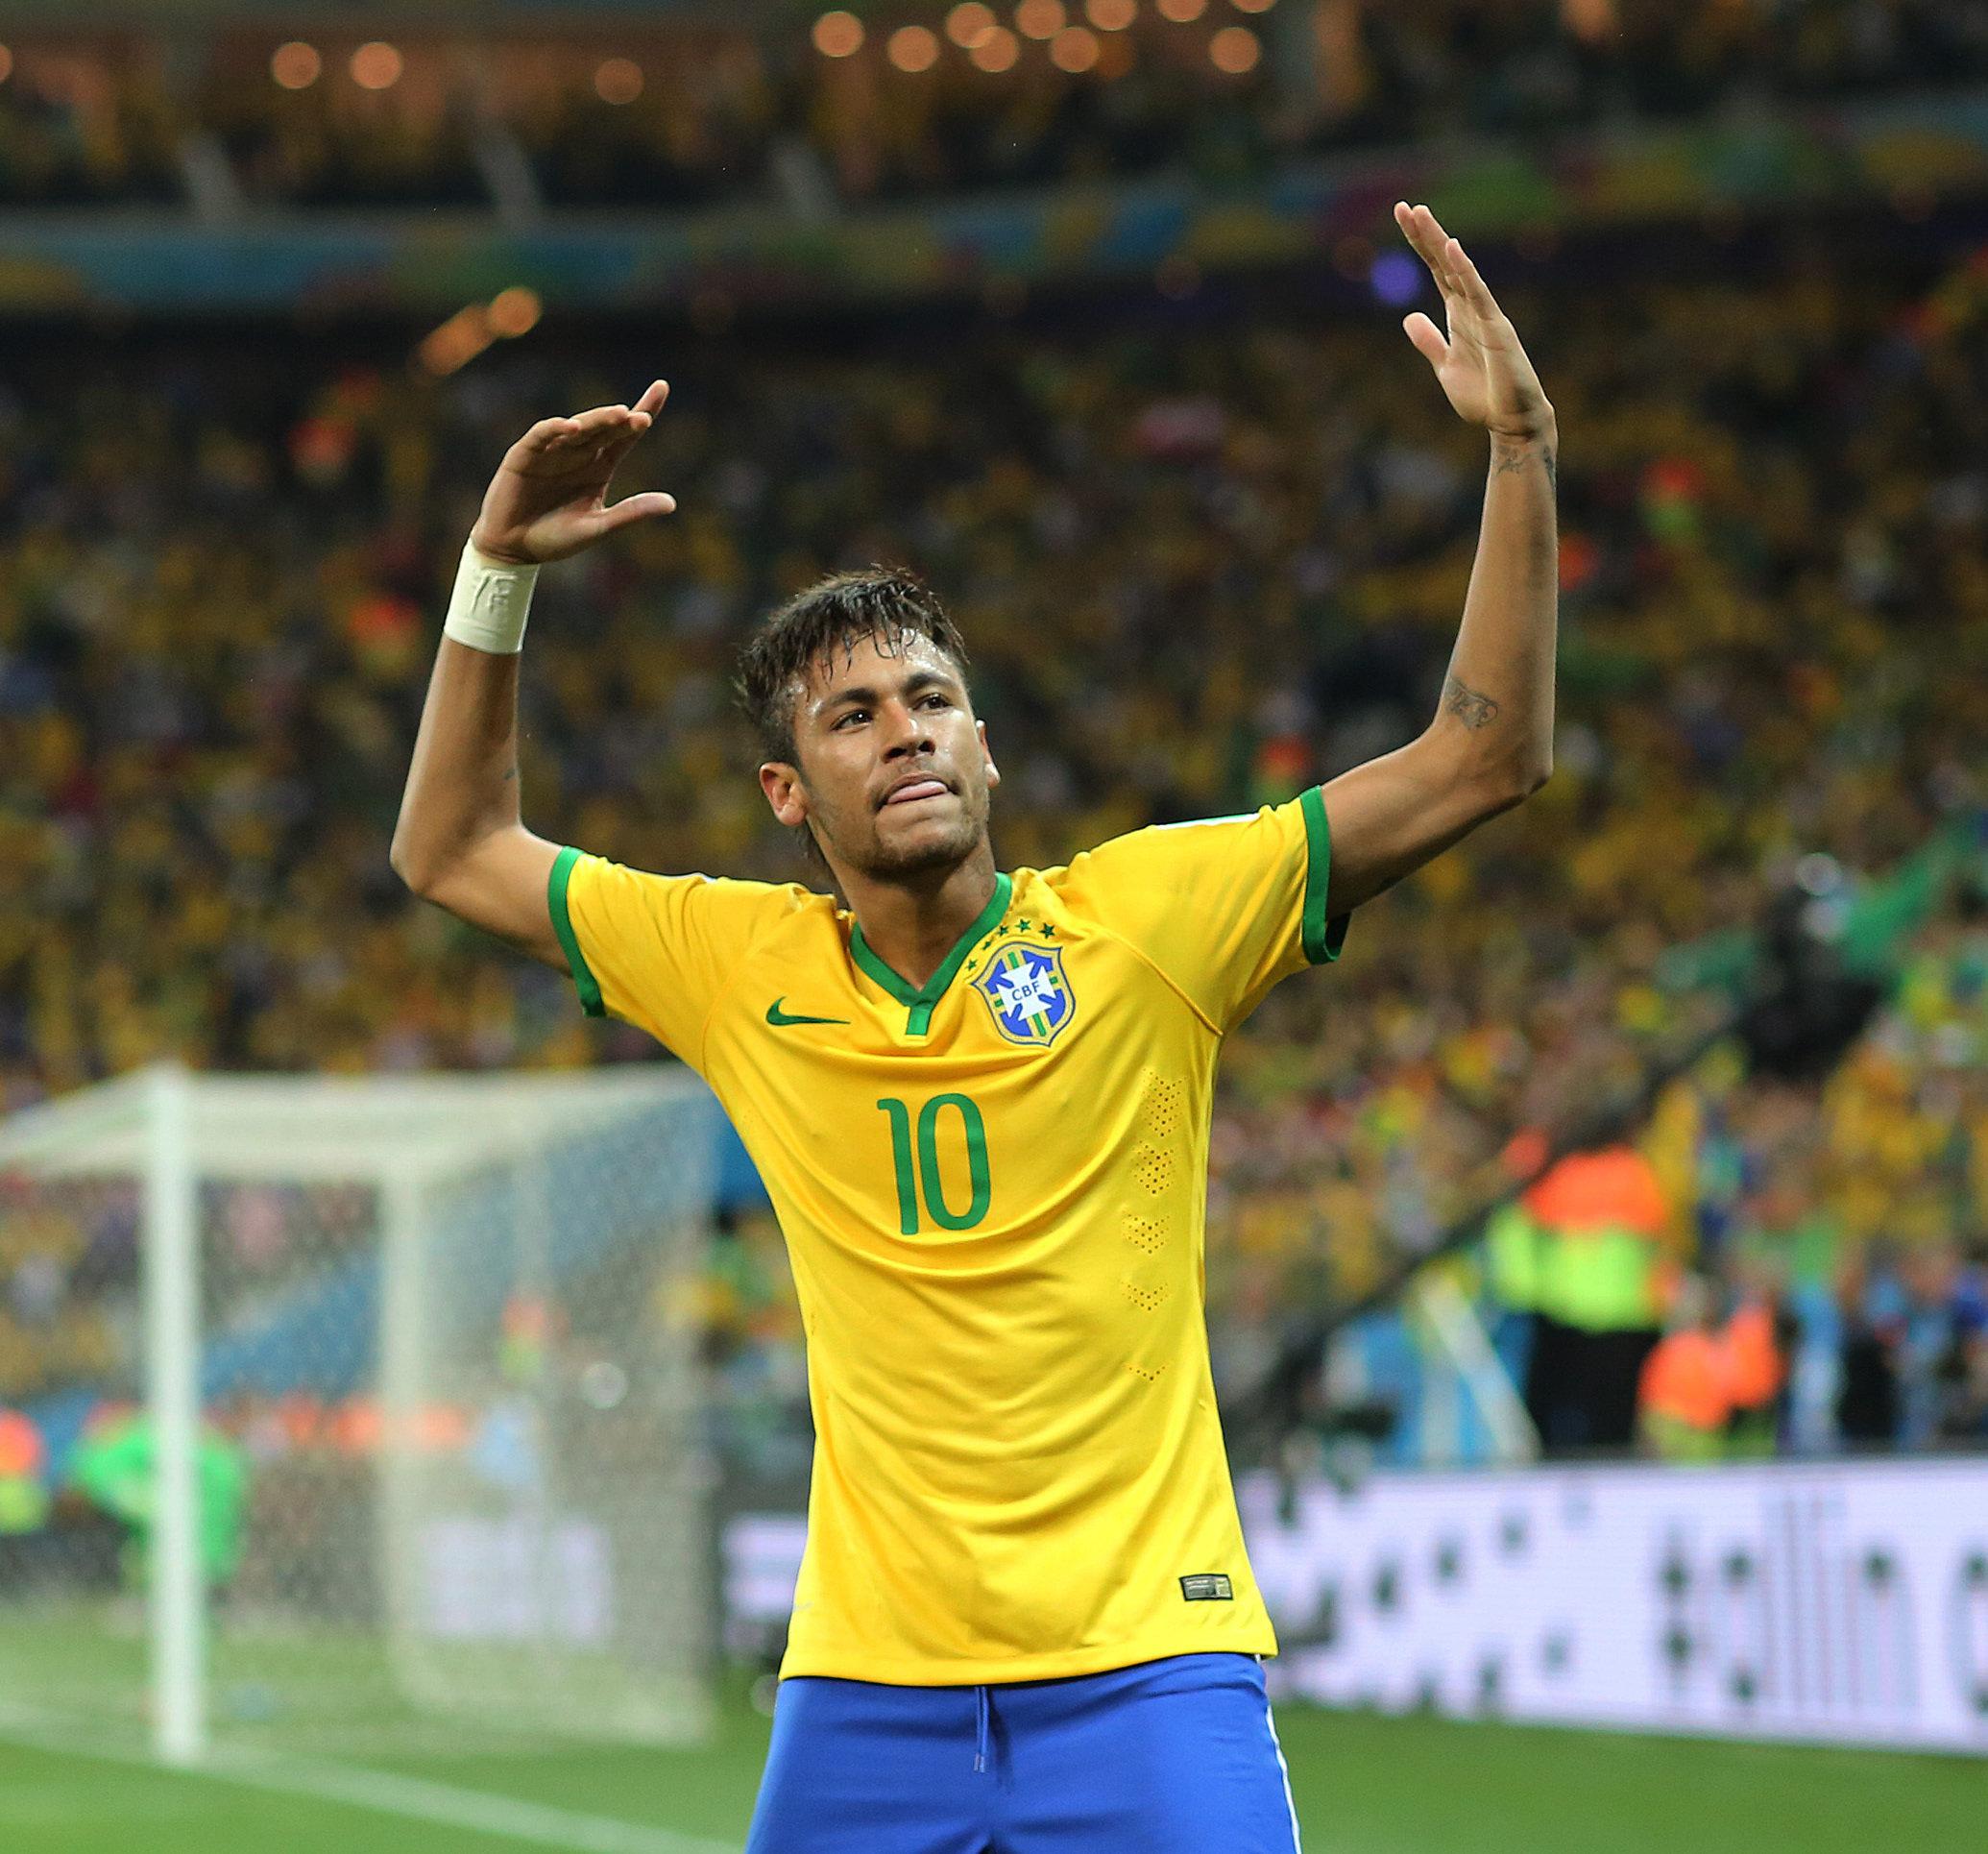 Brazil Galactico - Neymar Jr